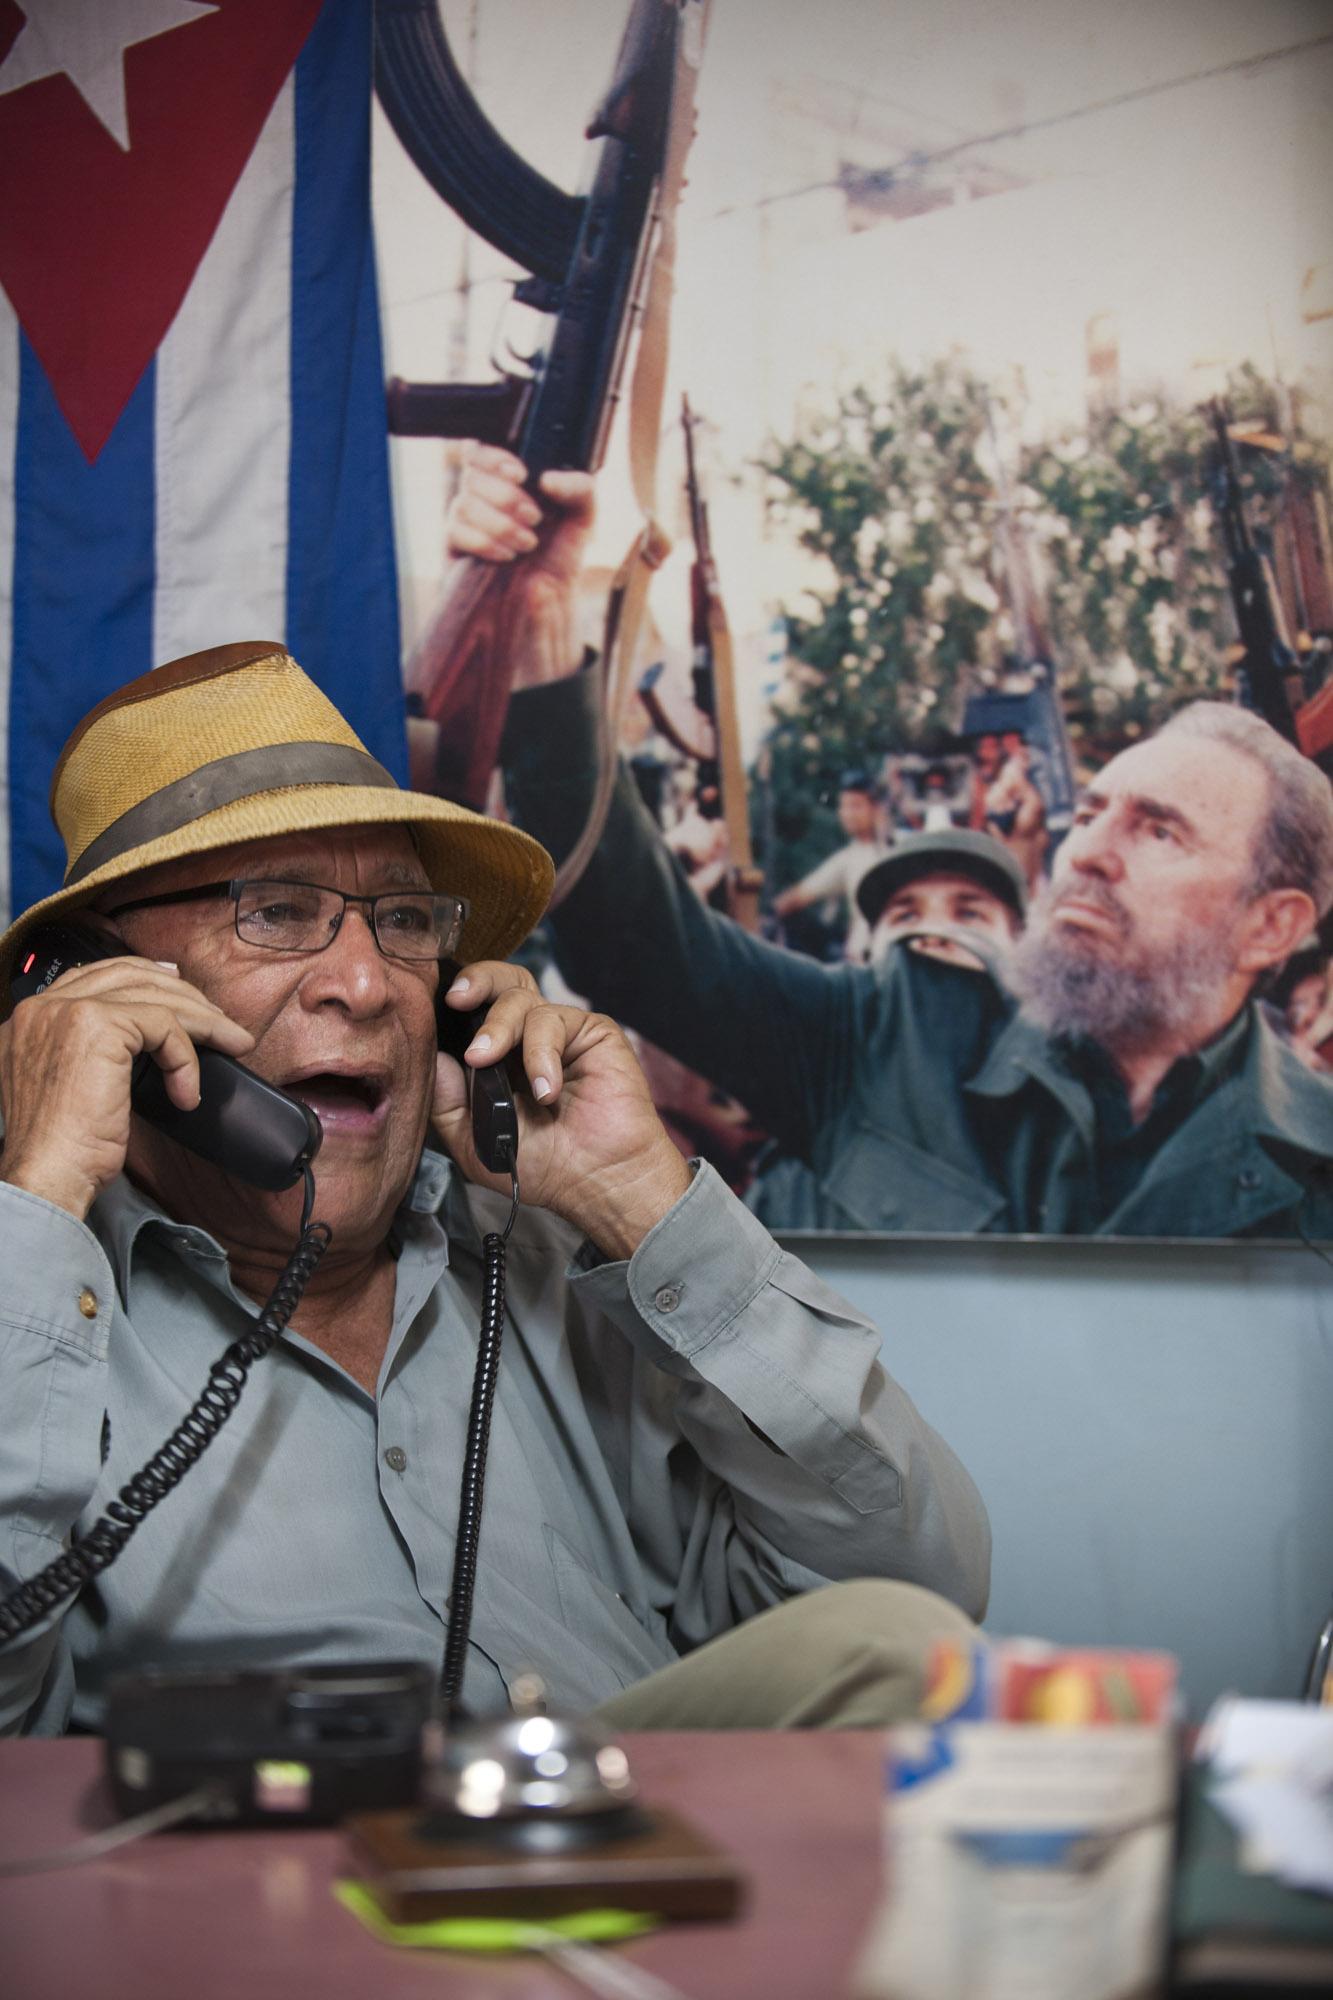 Llamado - Cuba - Hector Garrido, Aerial and human photography